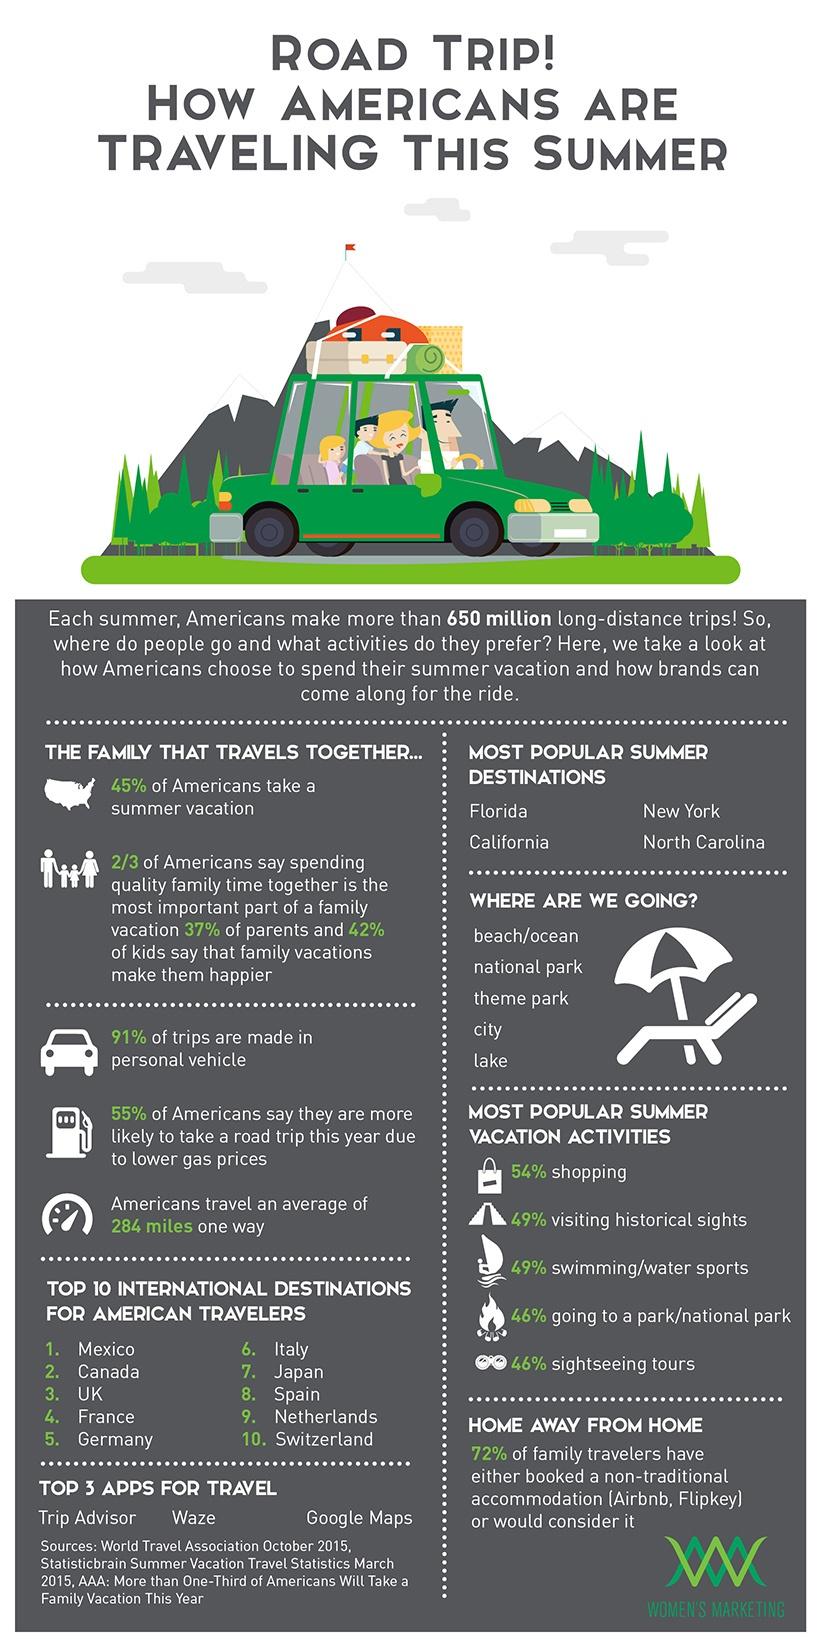 RoadTrip_Infographic.jpg